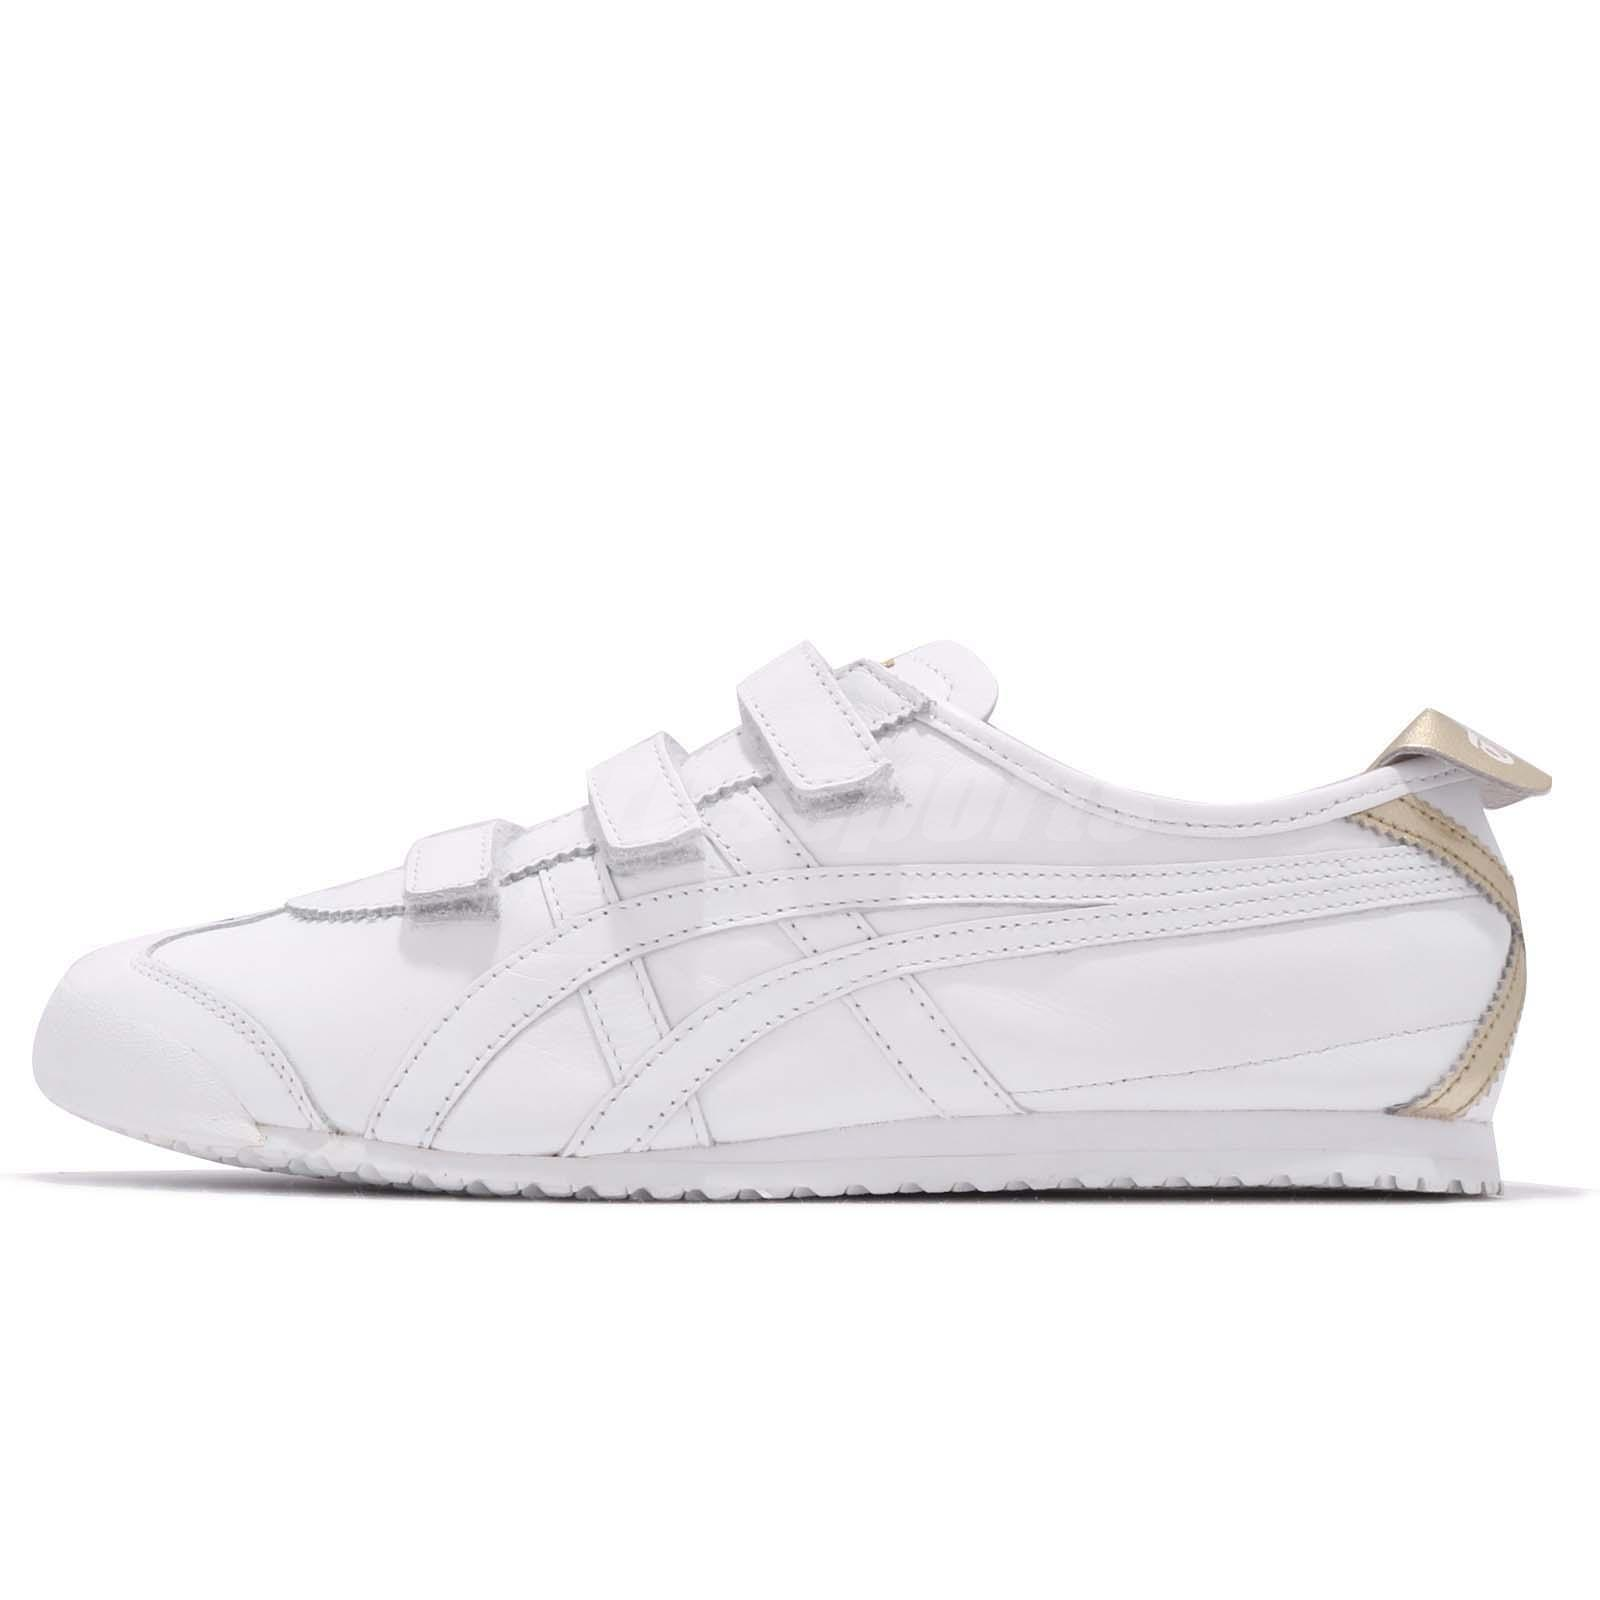 9ff1afe6d9 ... promo code for asics onitsuka tiger mexico 66 baja strap white gold men  shoe sneaker hk4a1